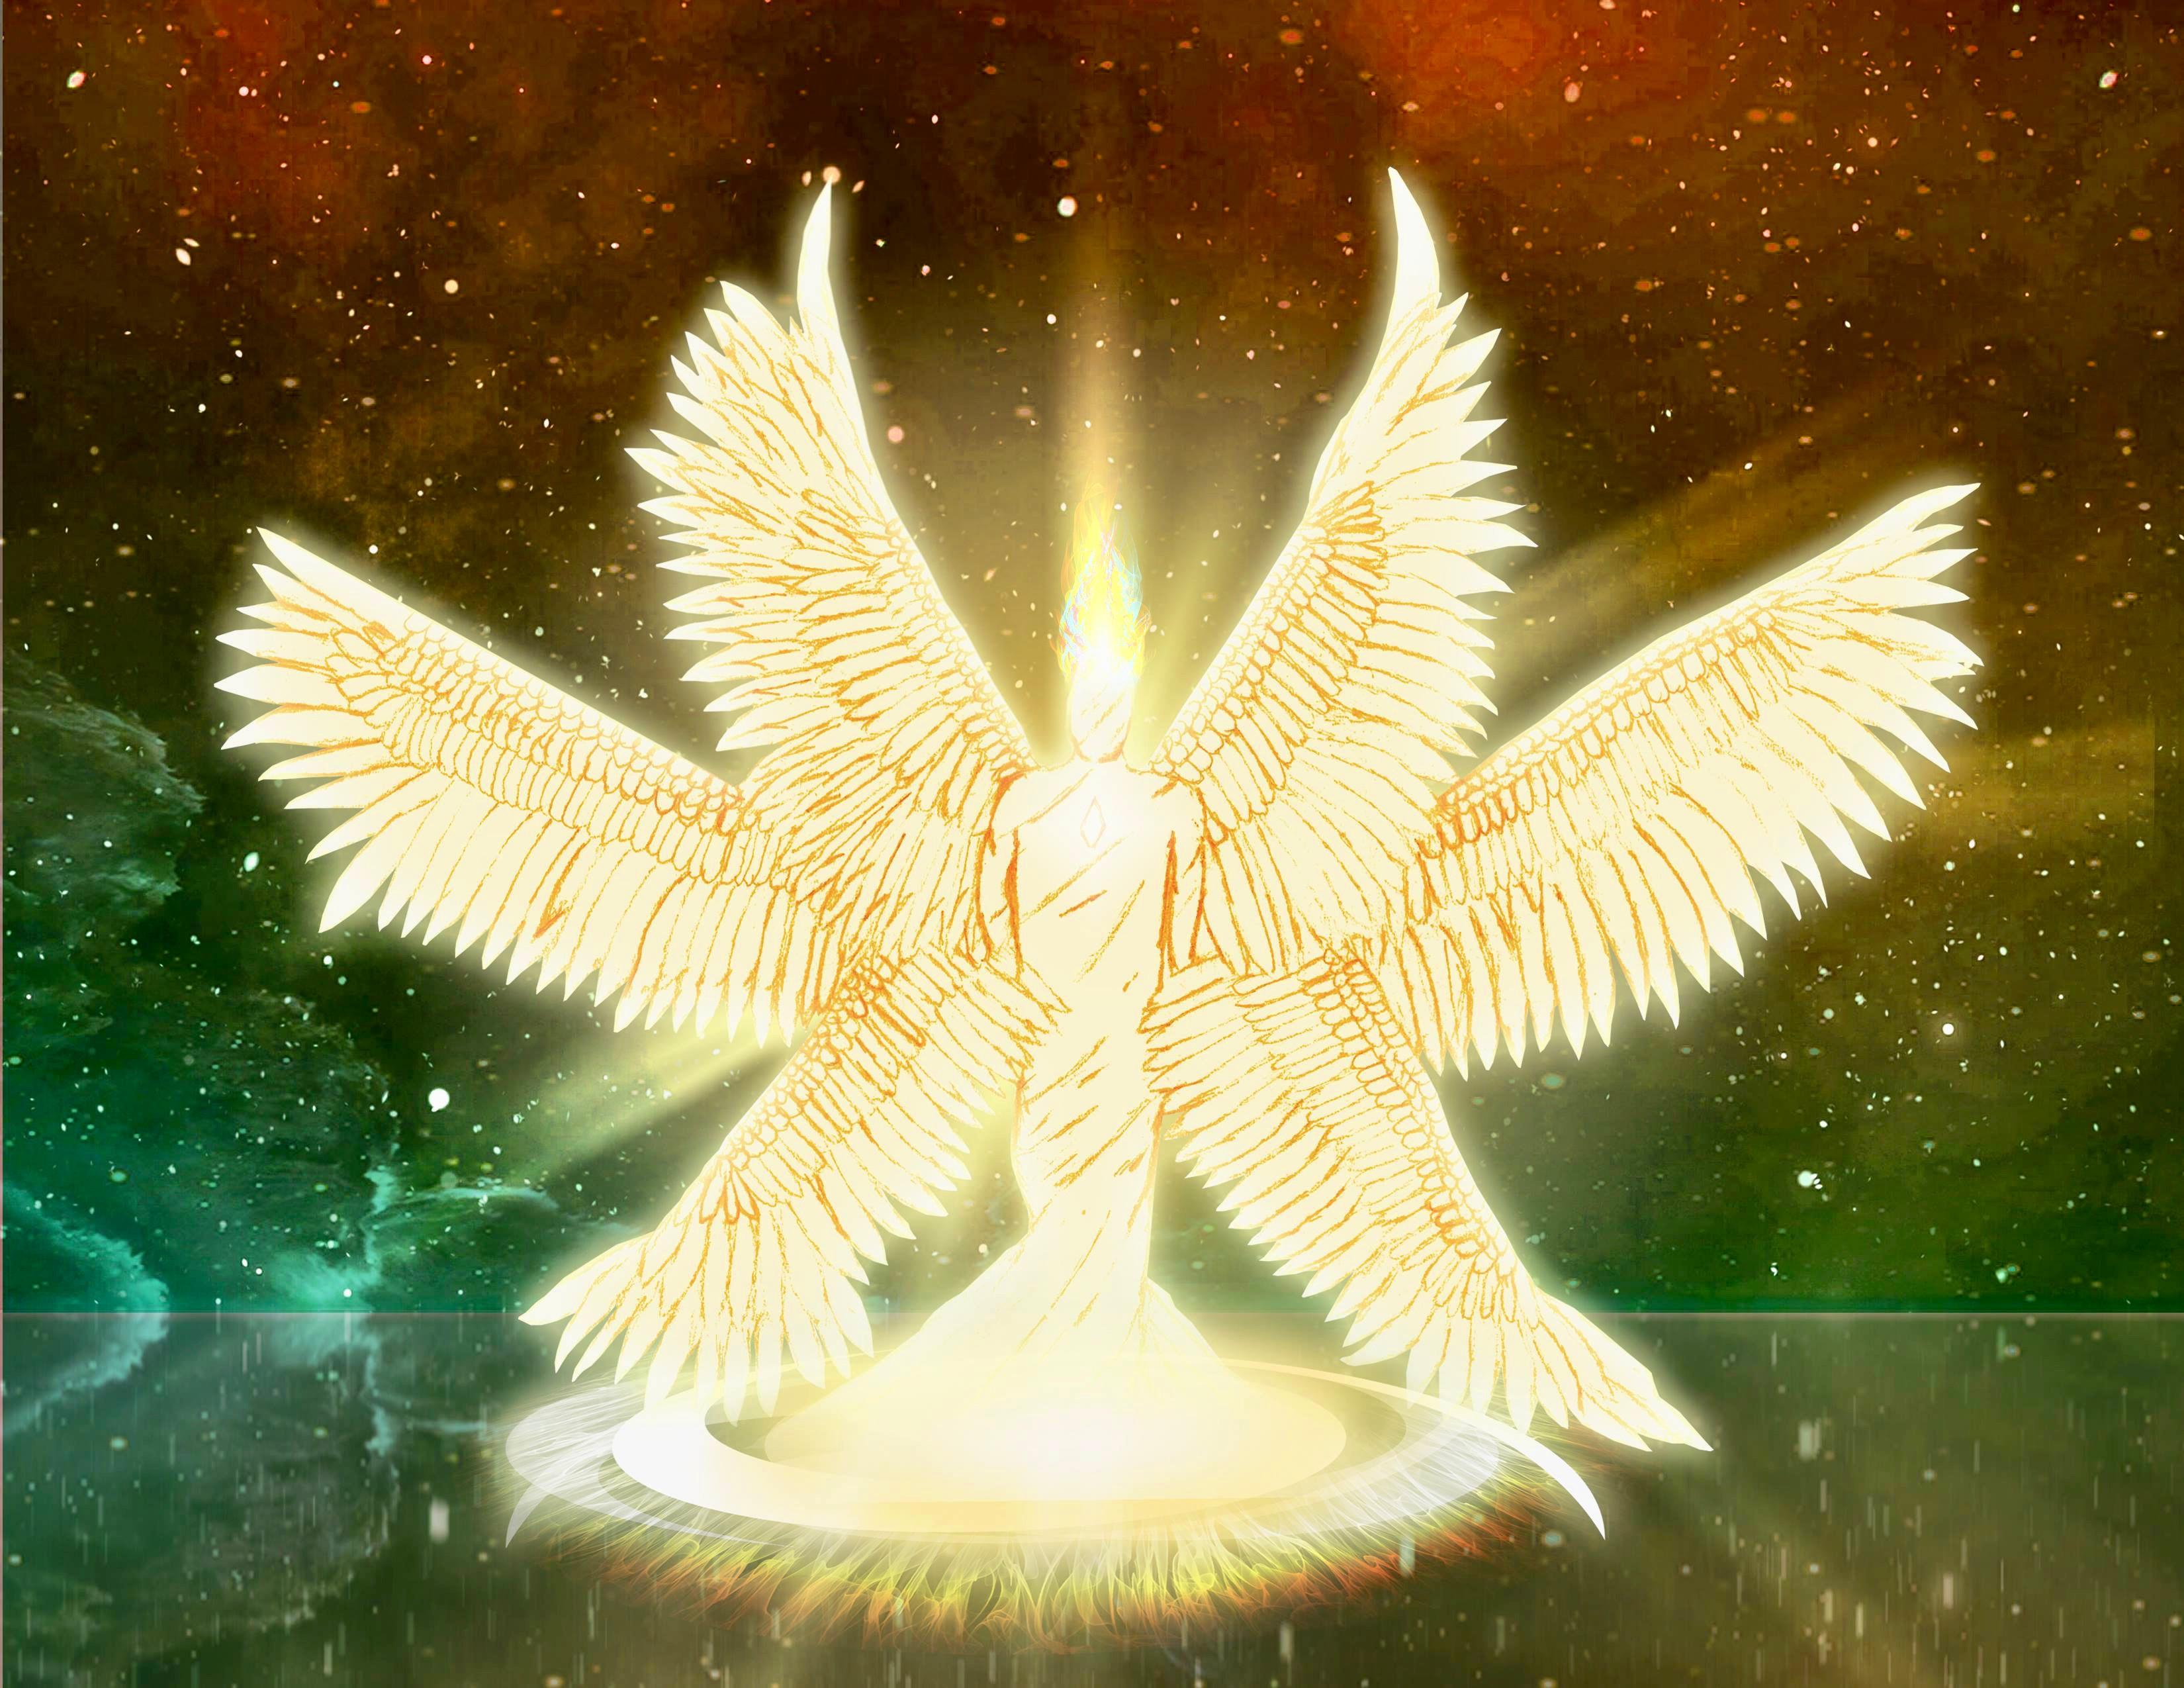 30 Minute Seraphim Blueprint